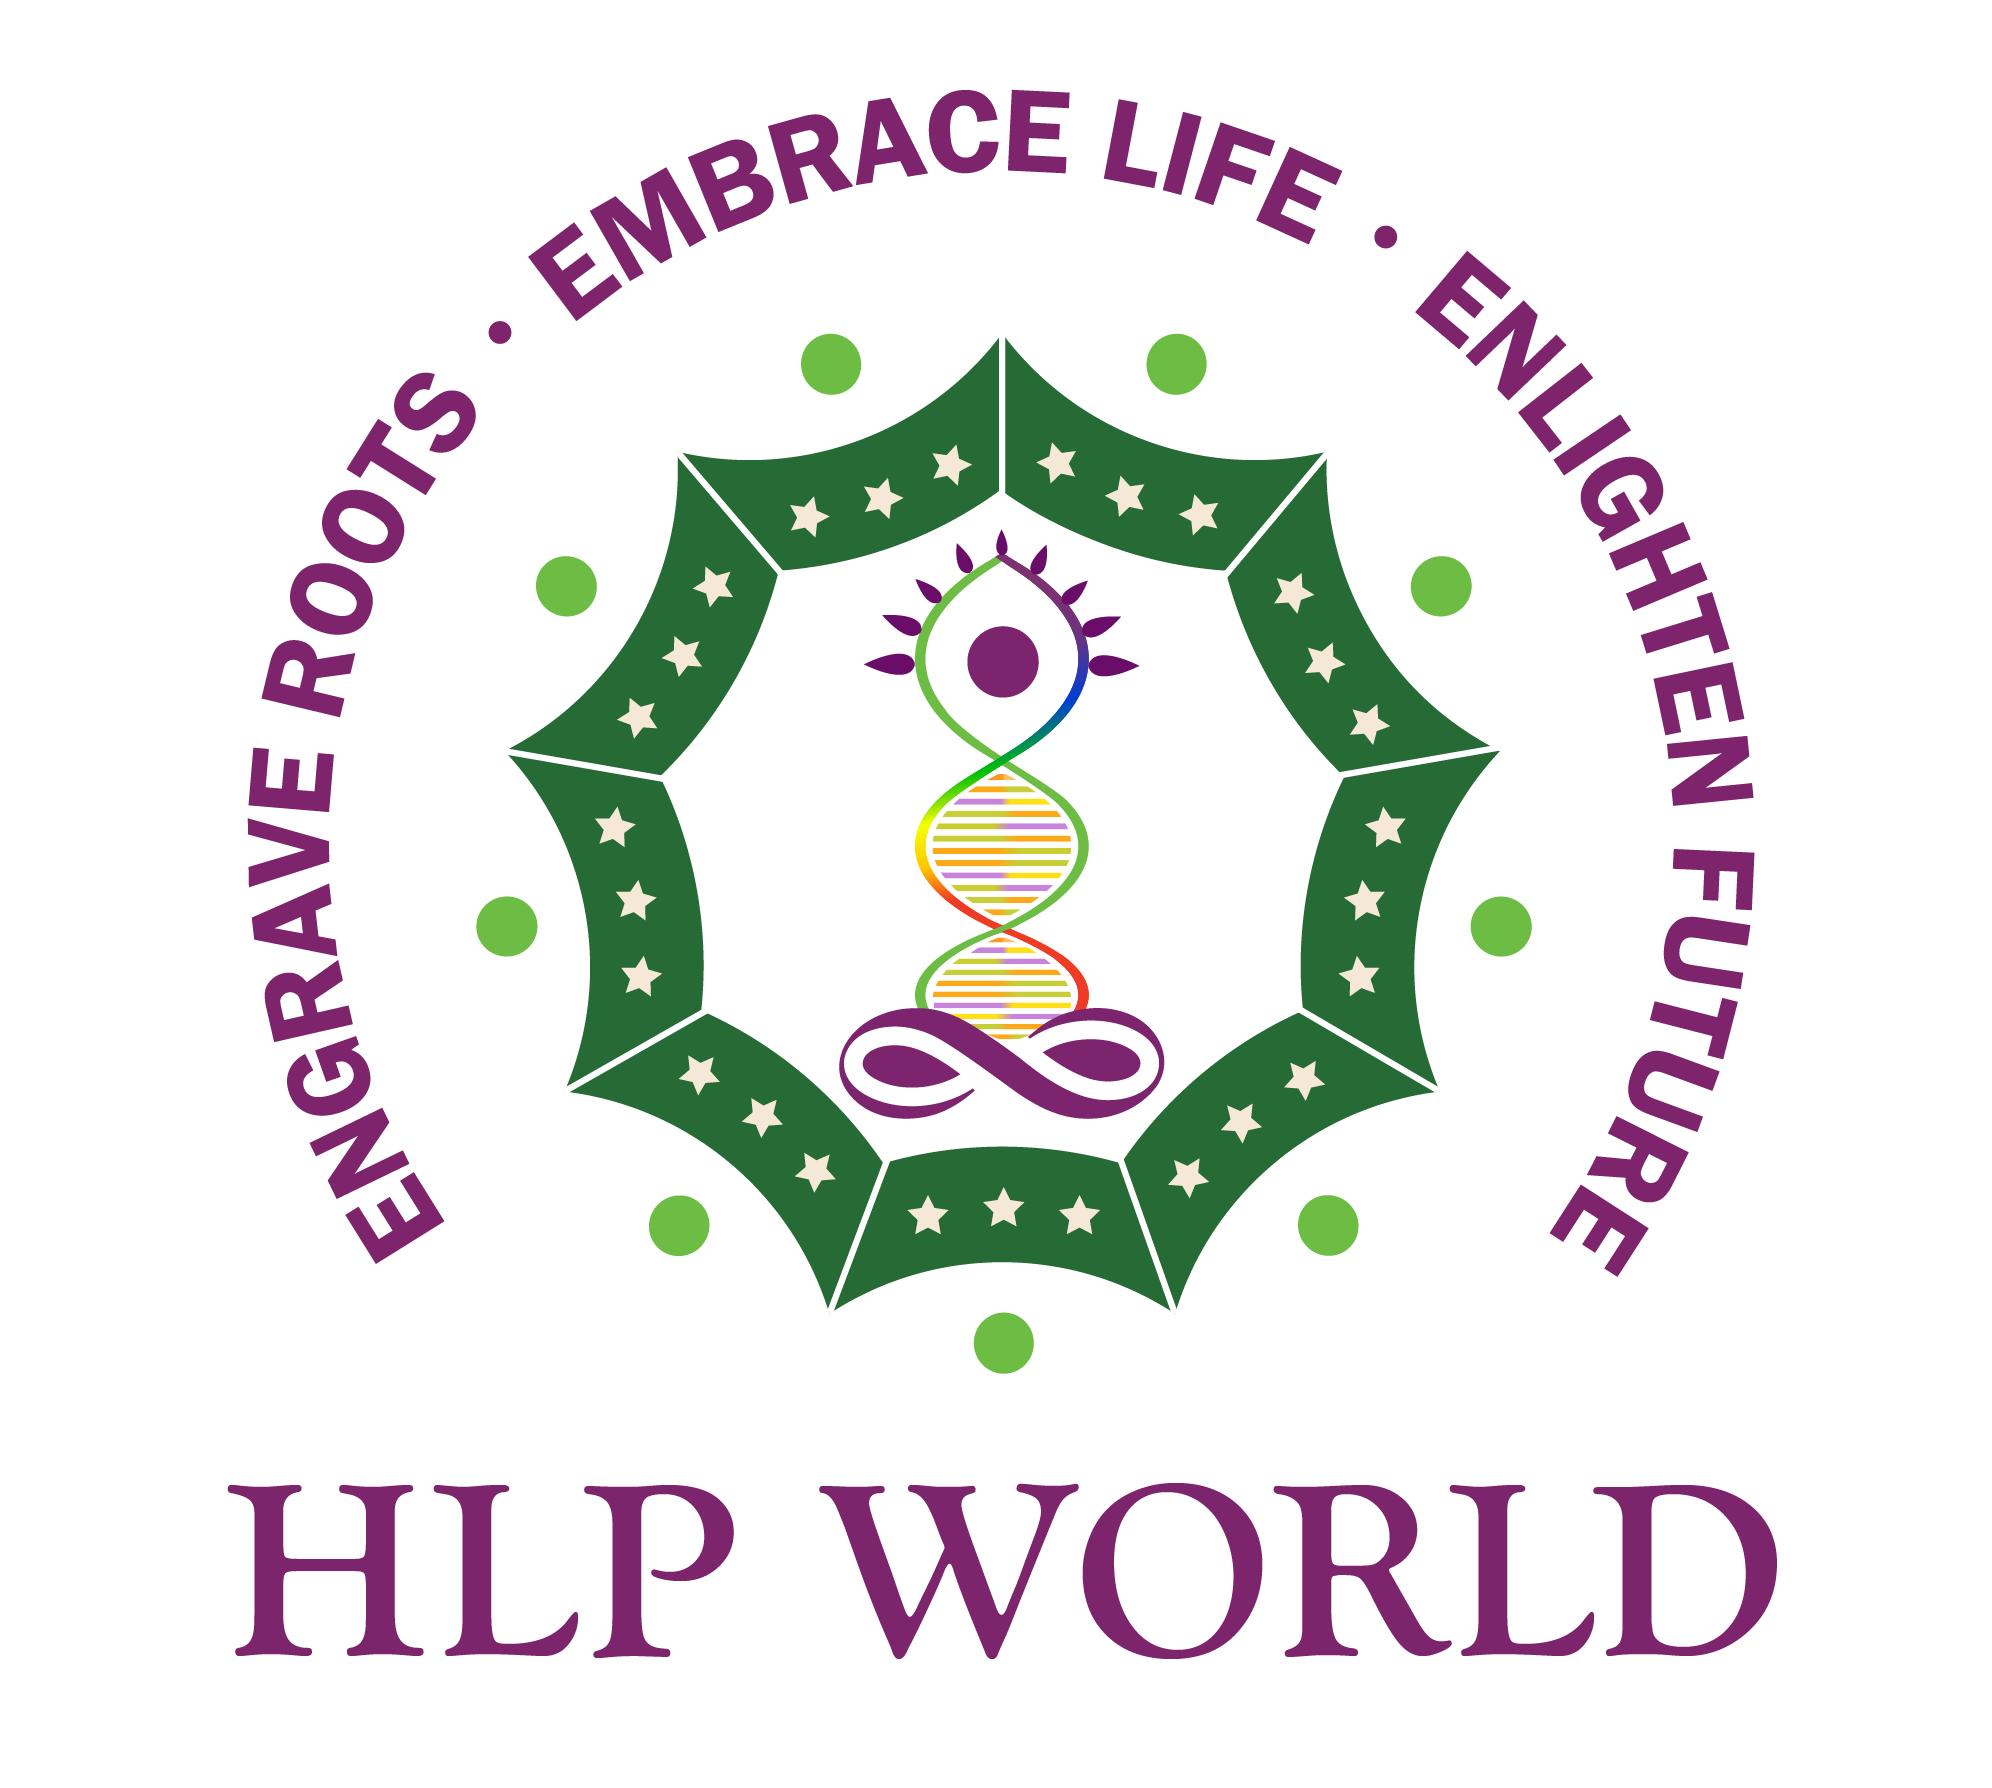 HLP World